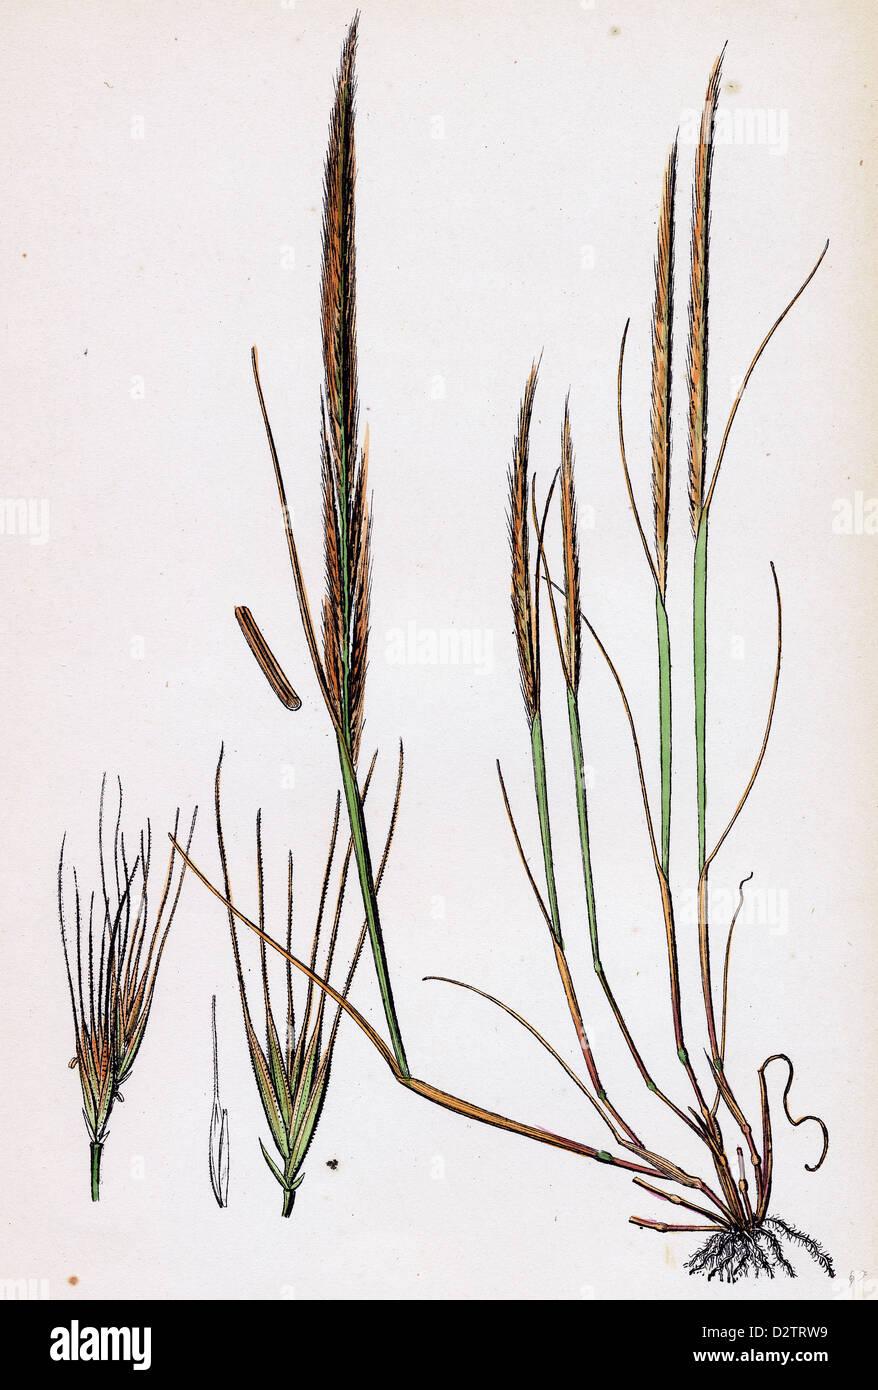 Festuca ambigua Ambiguous Fescue-grass - Stock Image